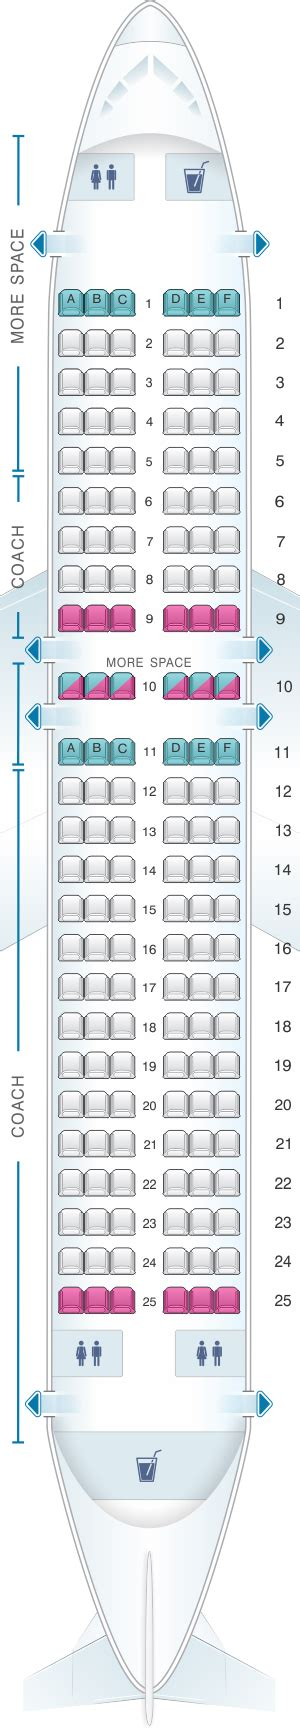 jet seats seat map jetblue airways airbus a320 seatmaestro